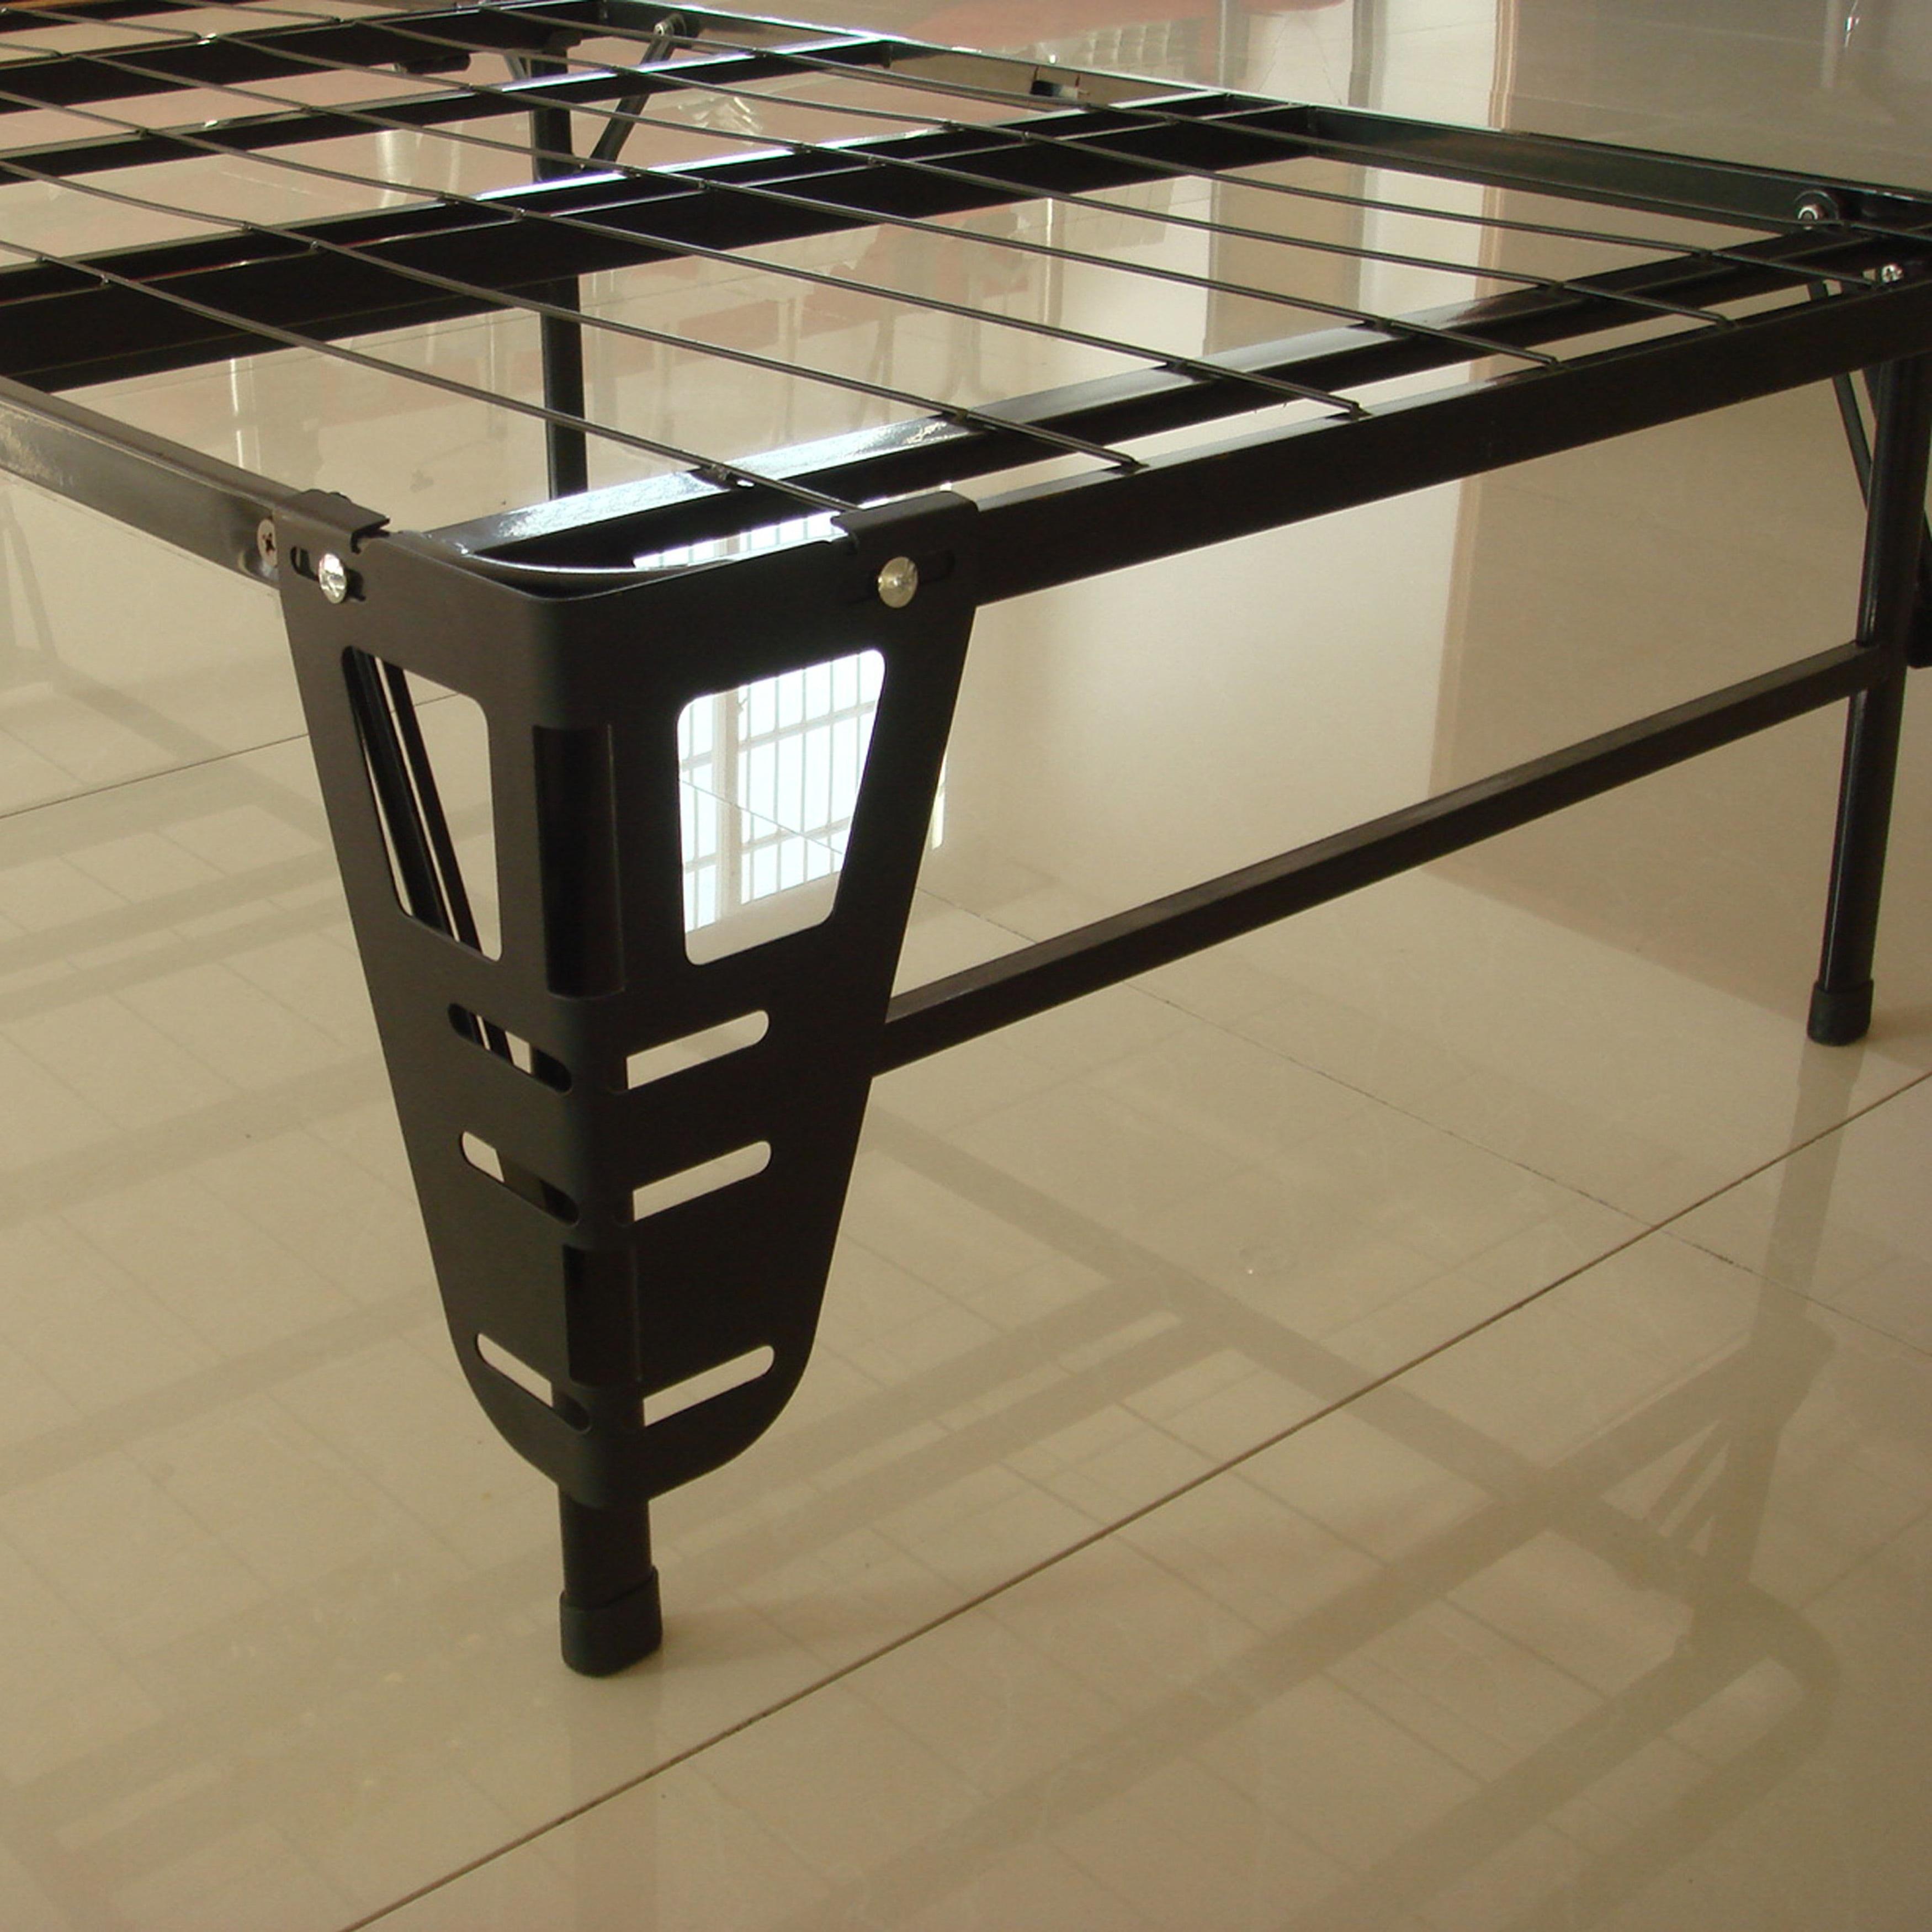 Shop Black Friday Deals On Durabed Platform Bed Steel Headboard Brackets Kit Overstock 7718638